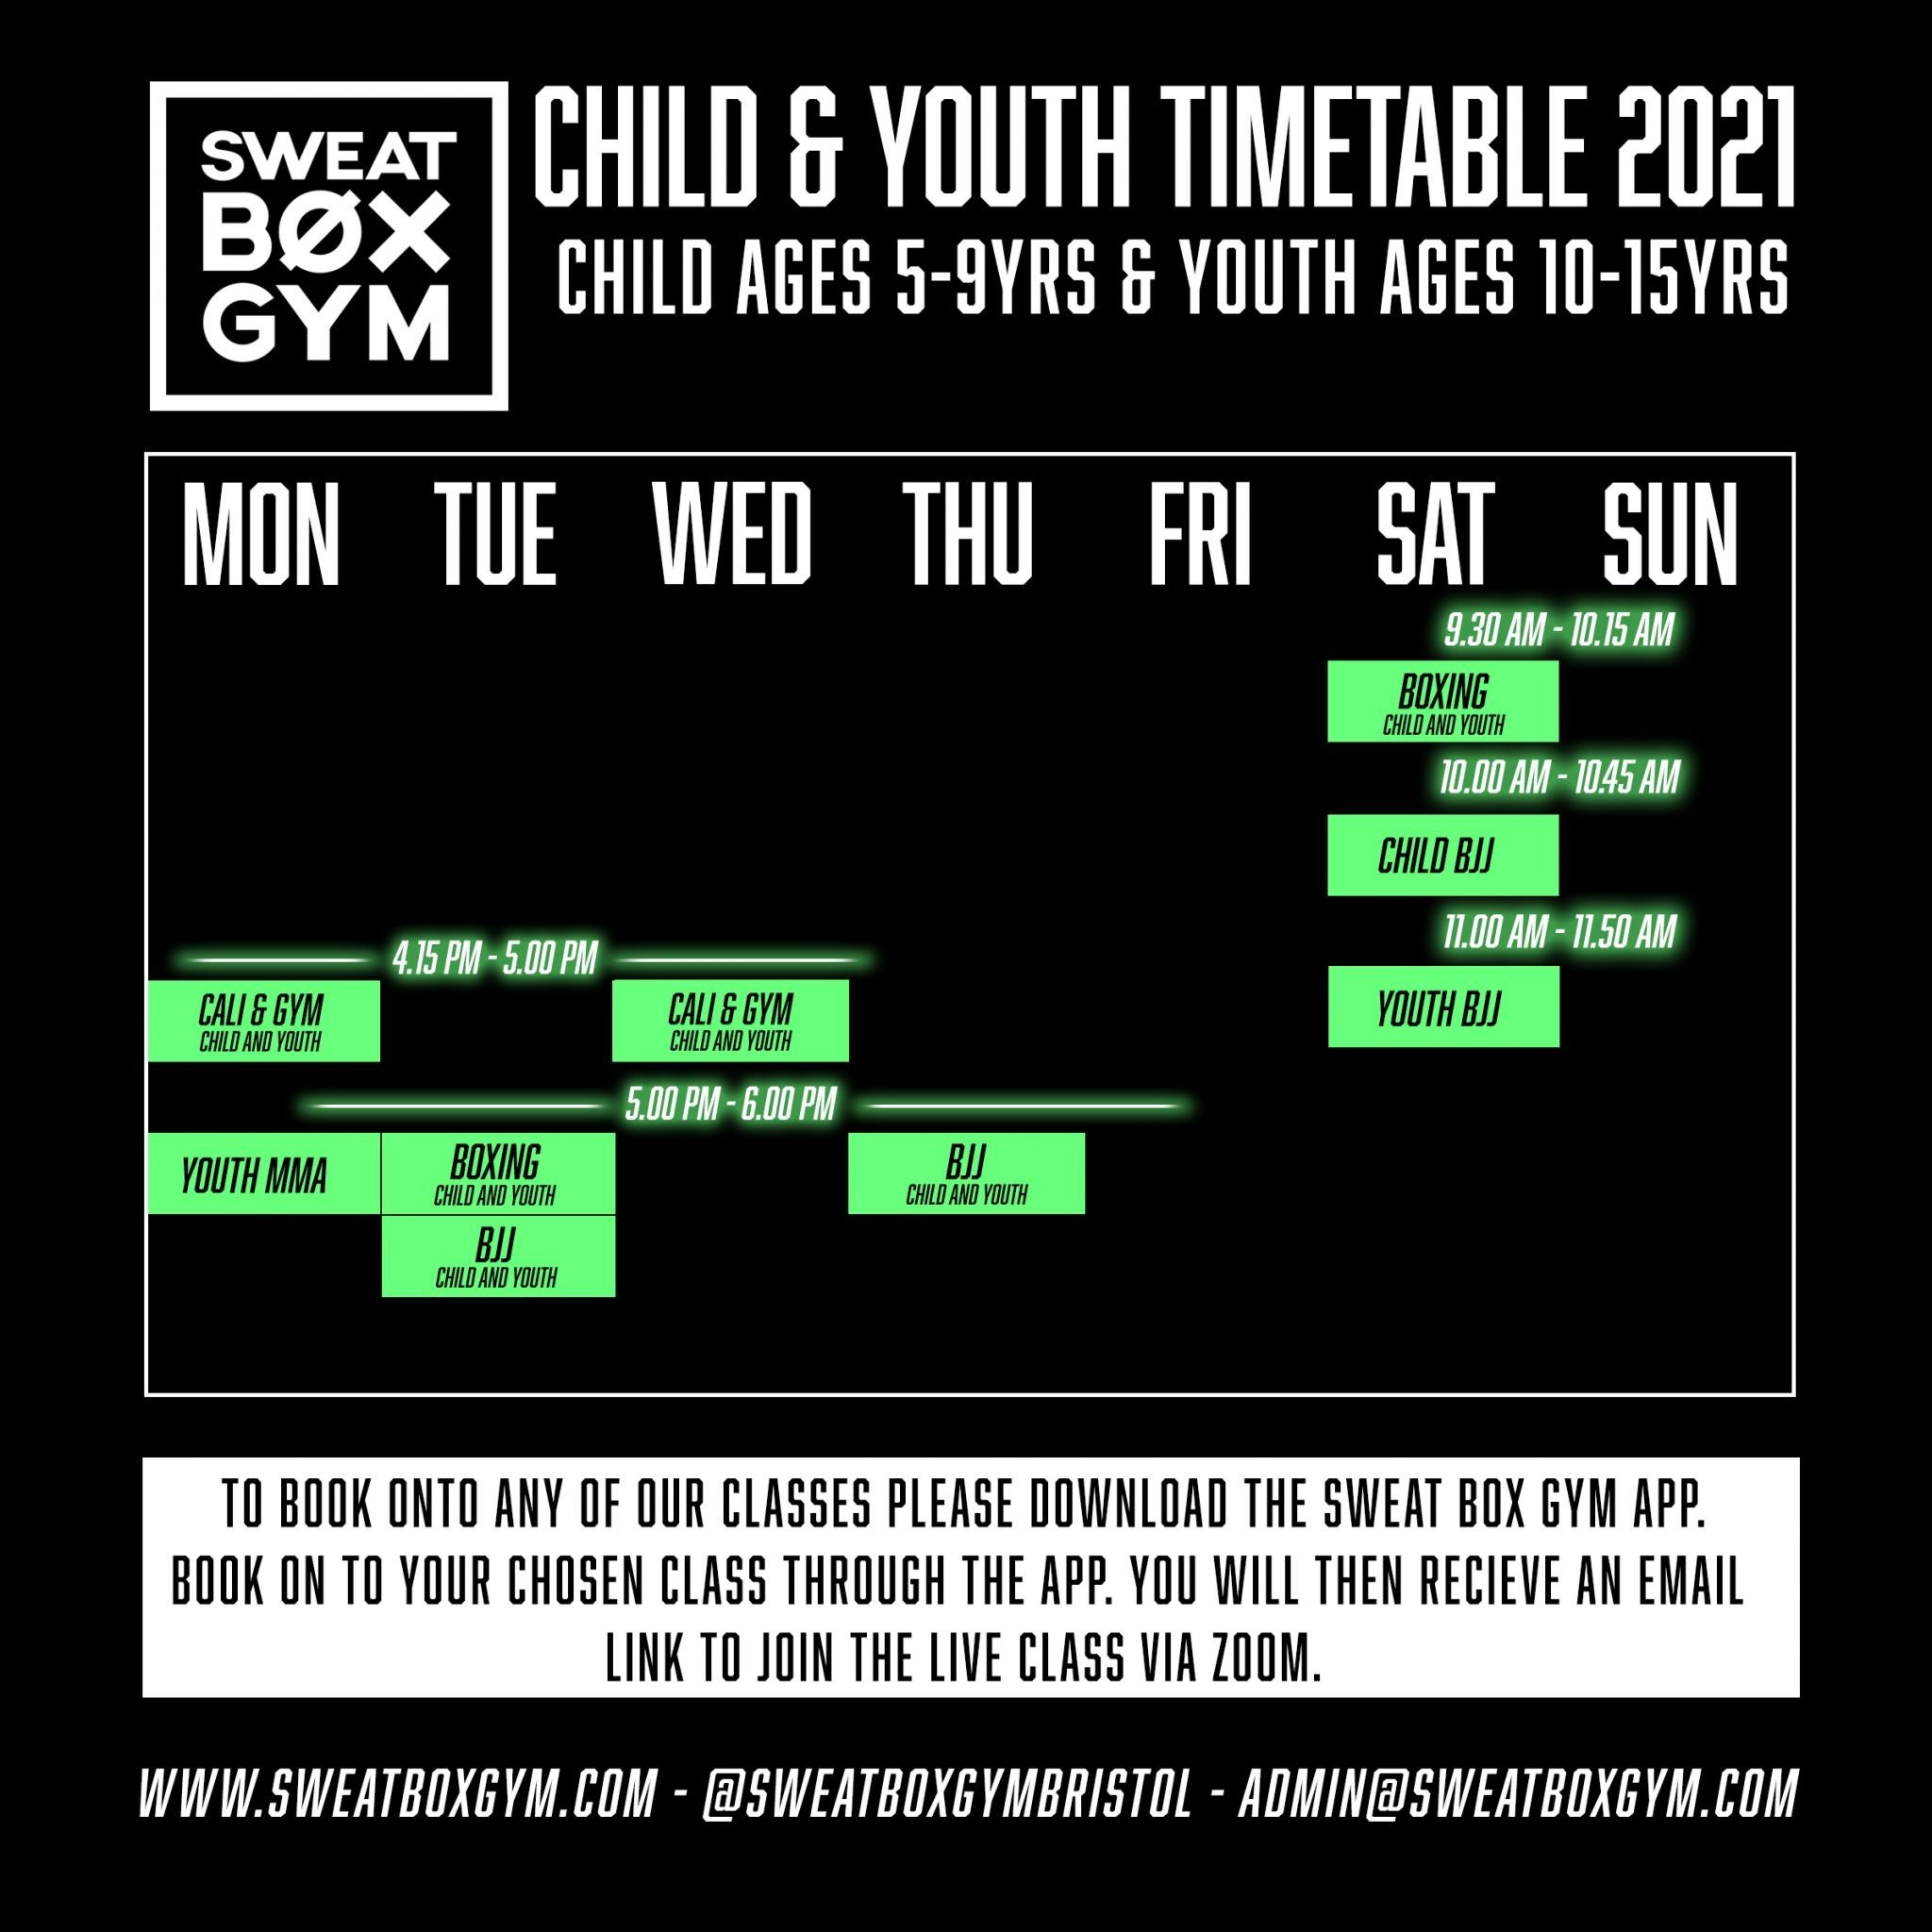 Newest 1 Kids Timetabke April 21 Timetable Copy